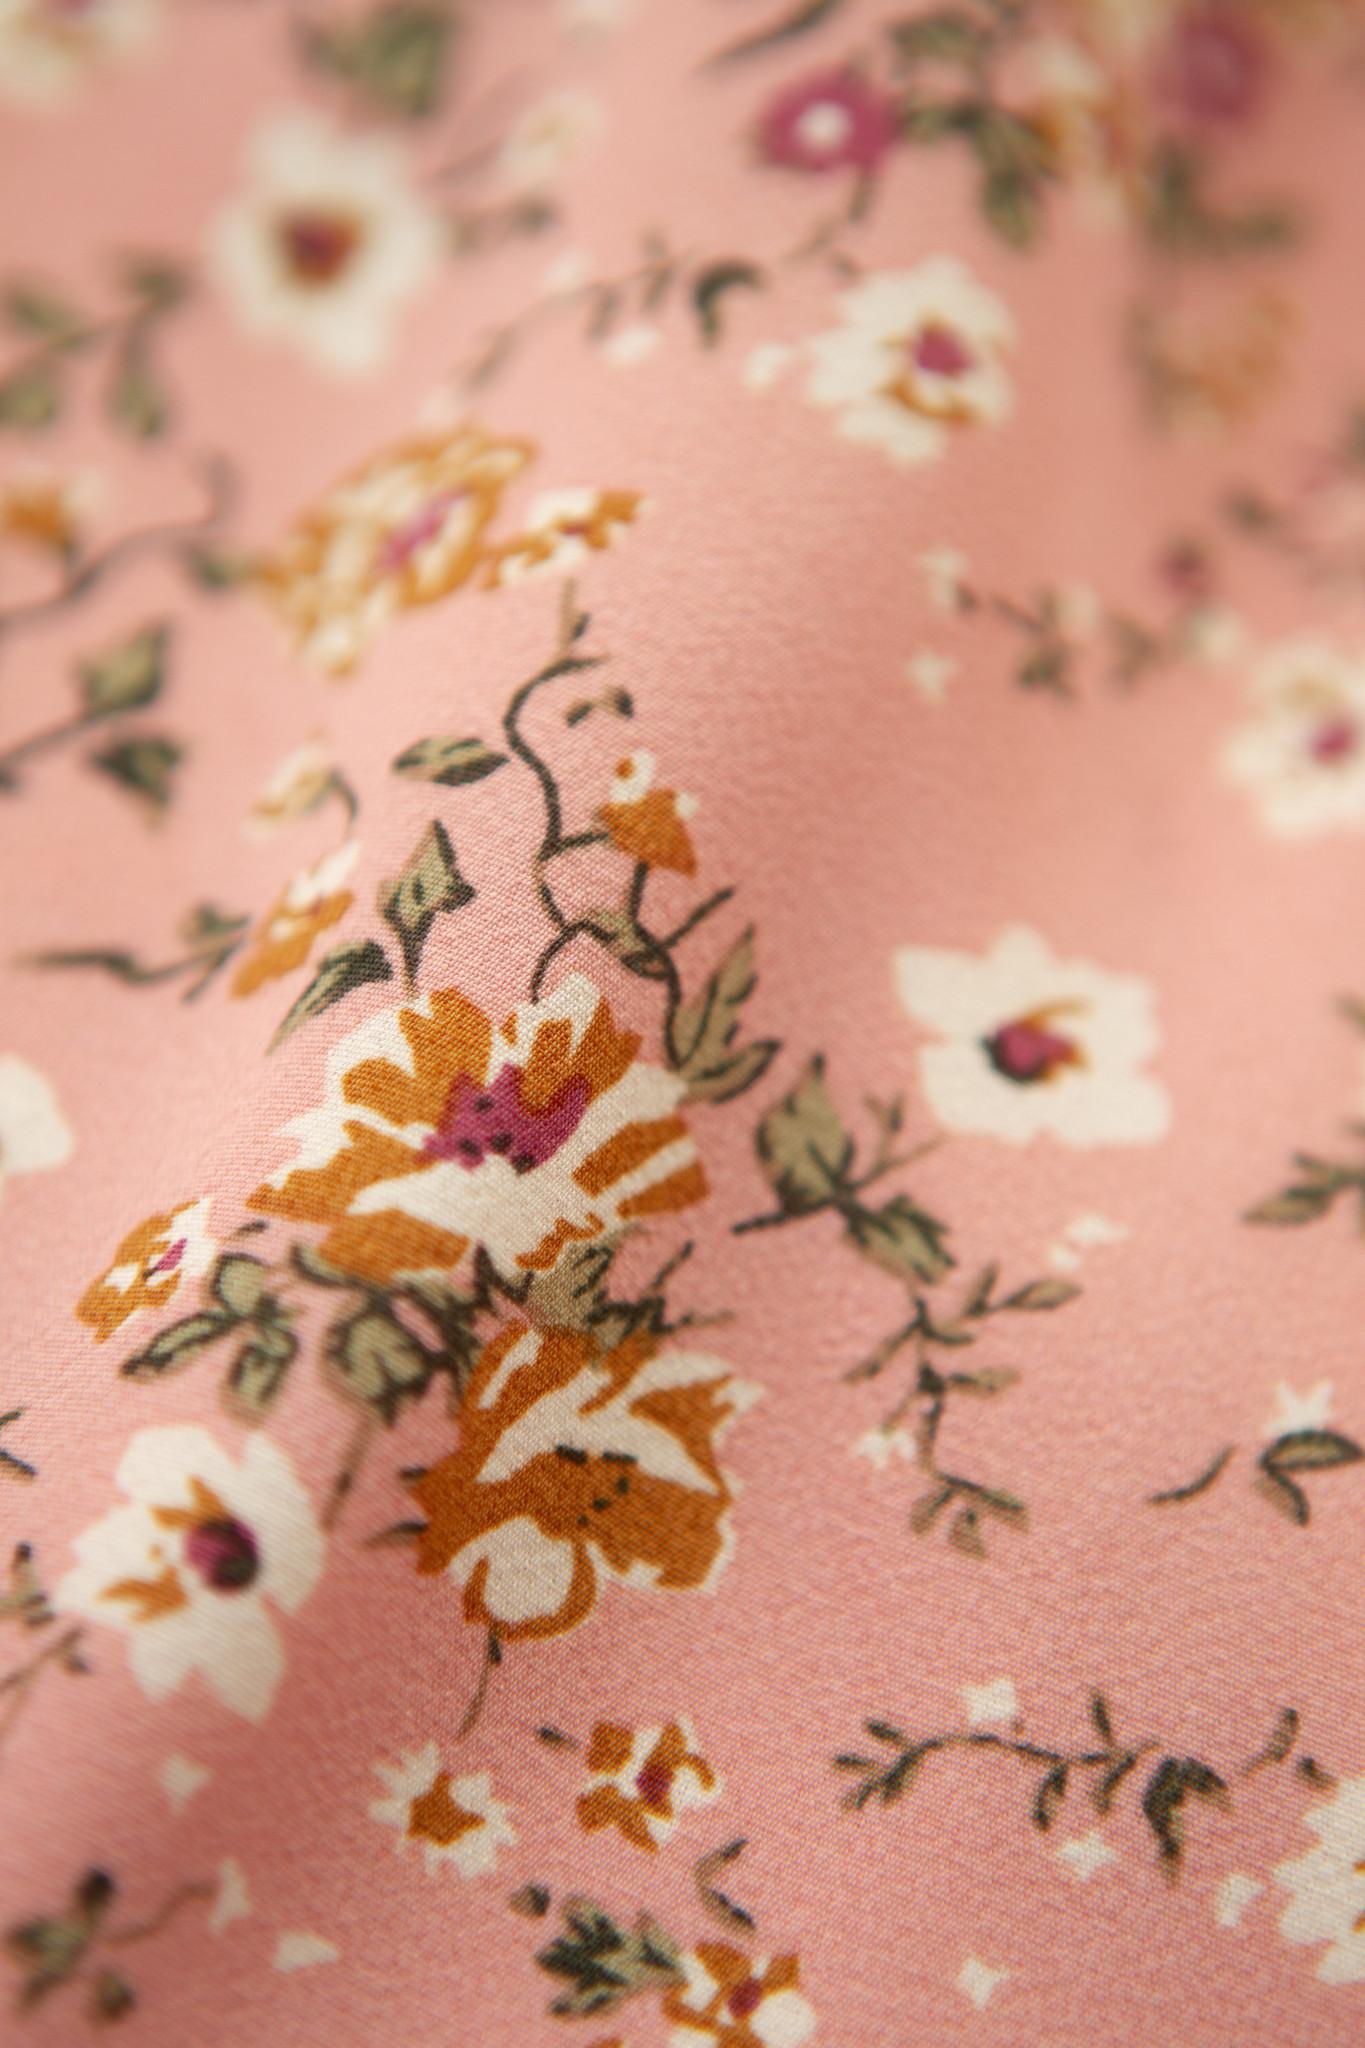 Lofty Manner Pink Flower Crop Top Milja